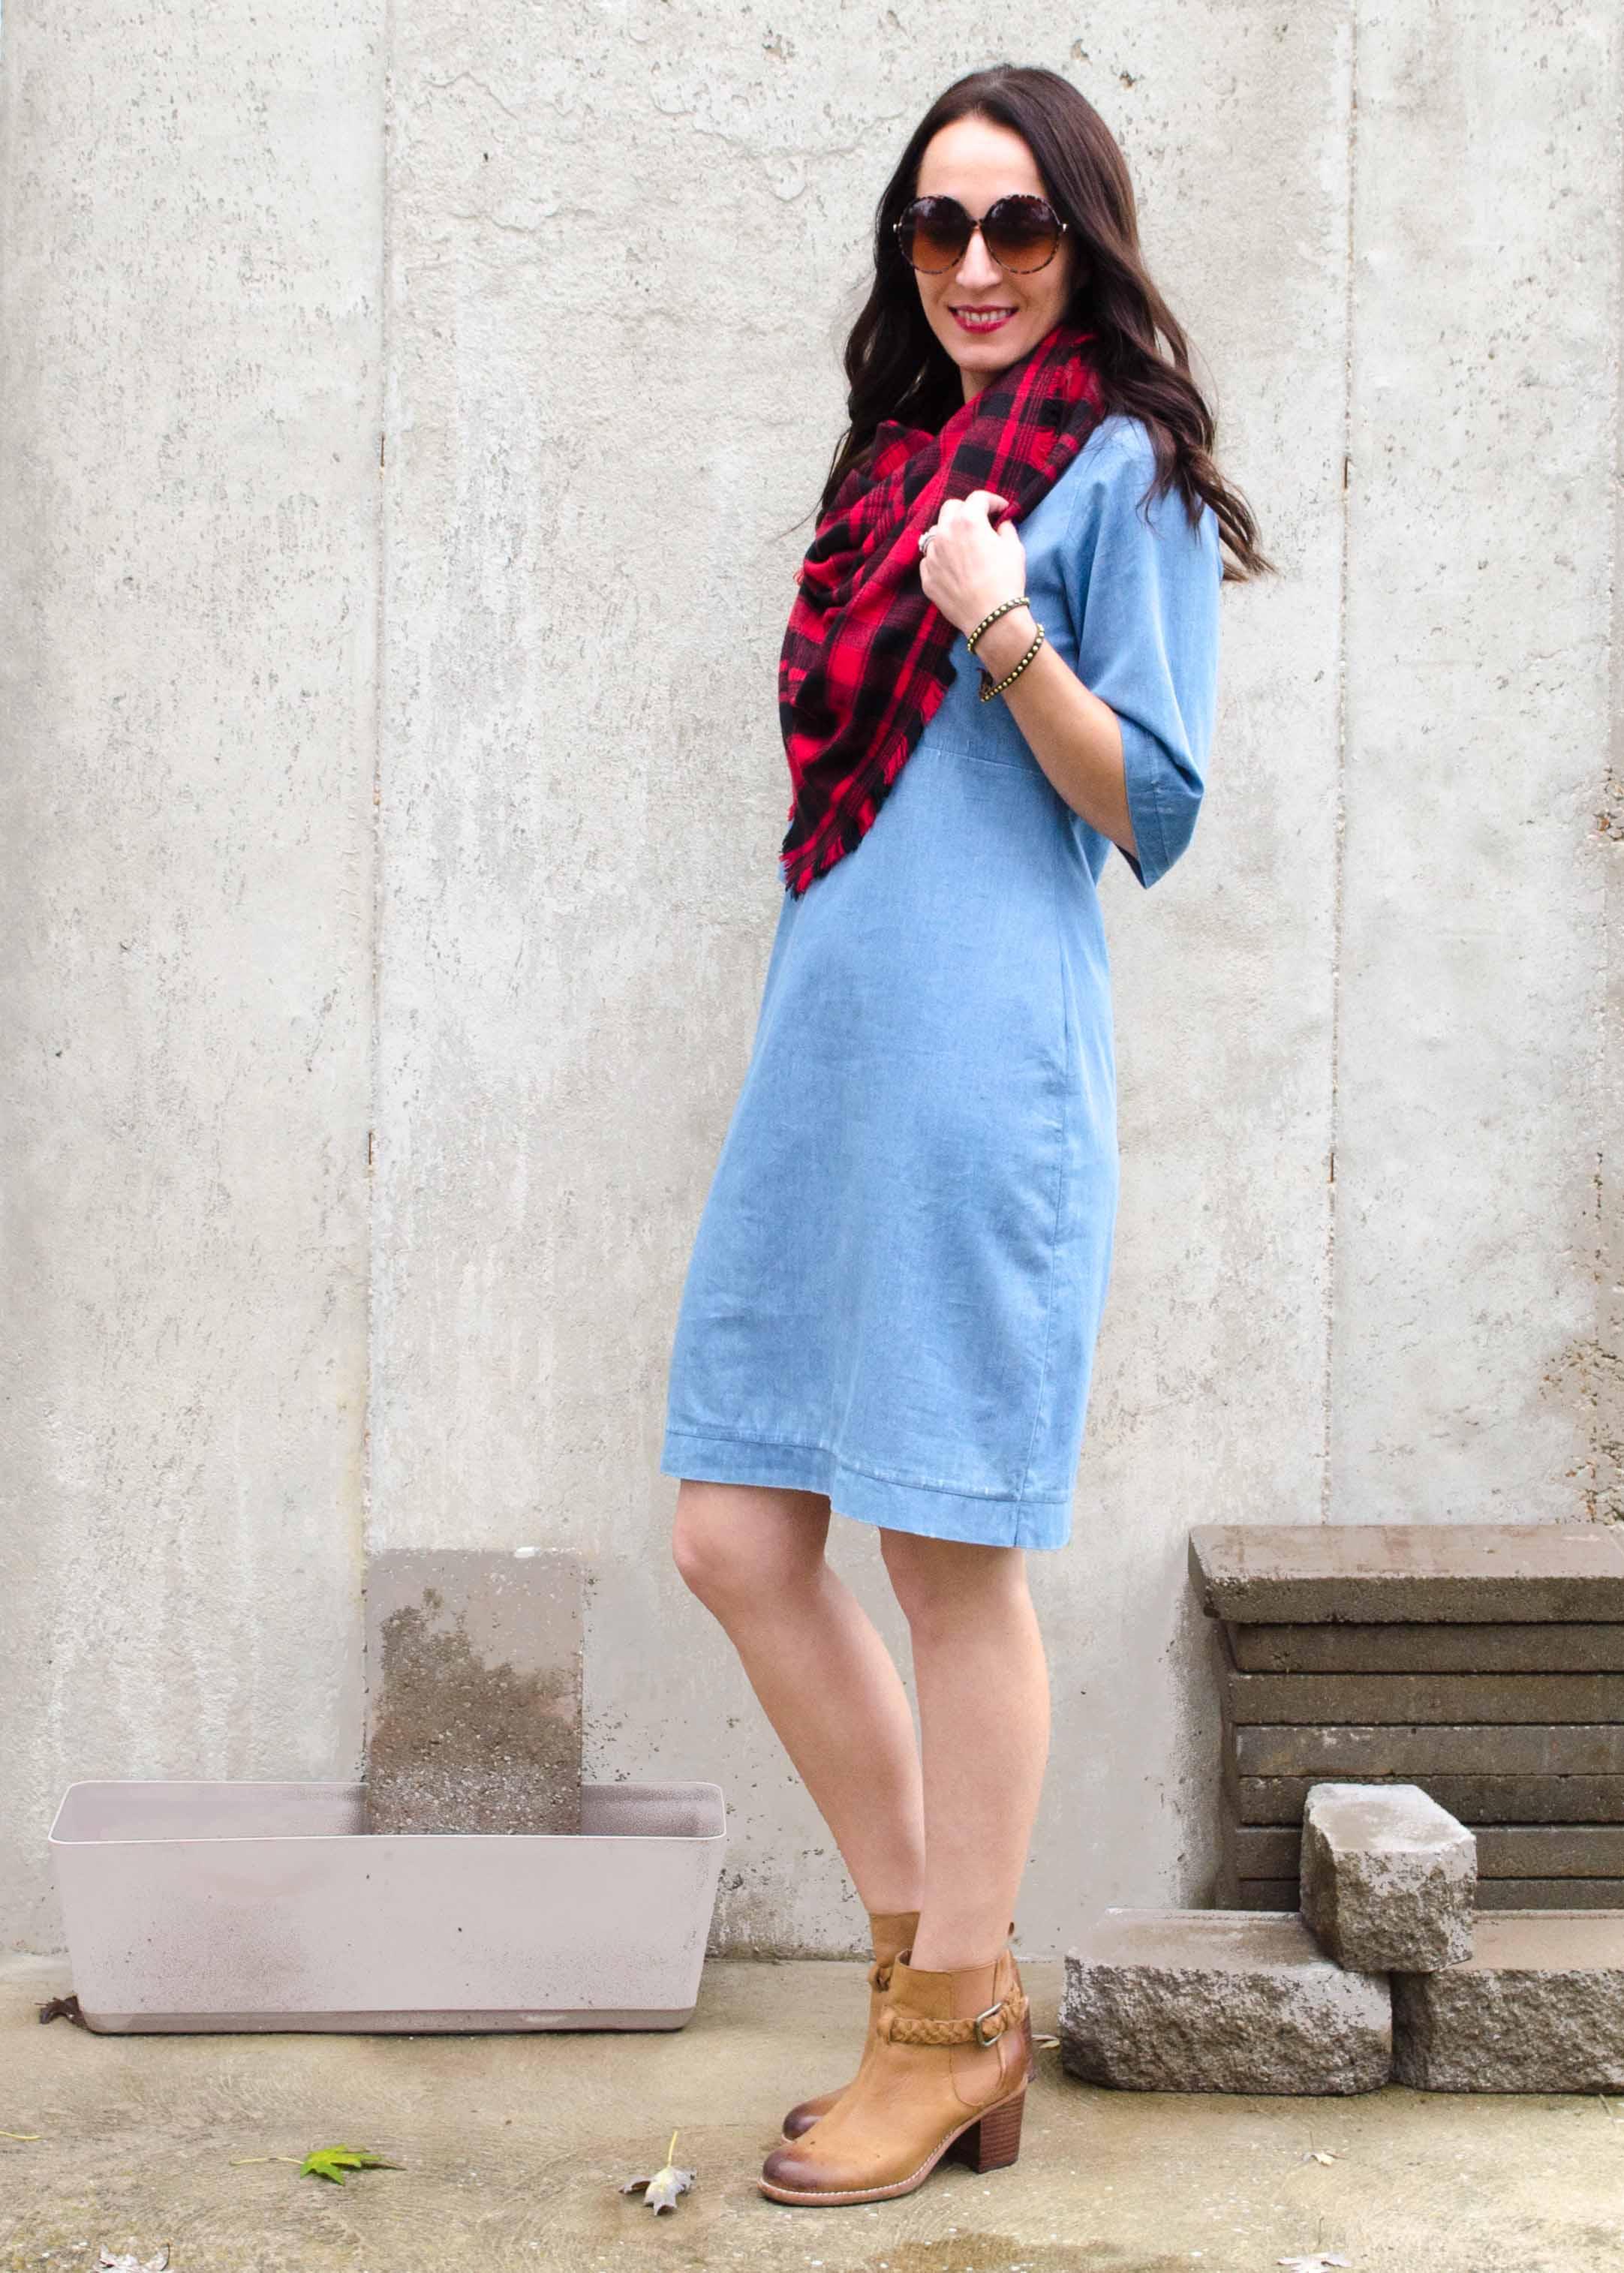 Blanket Scarf: DIY (No Sew) Flannel Blanket Scarf Tutorial   Boots: Sperry